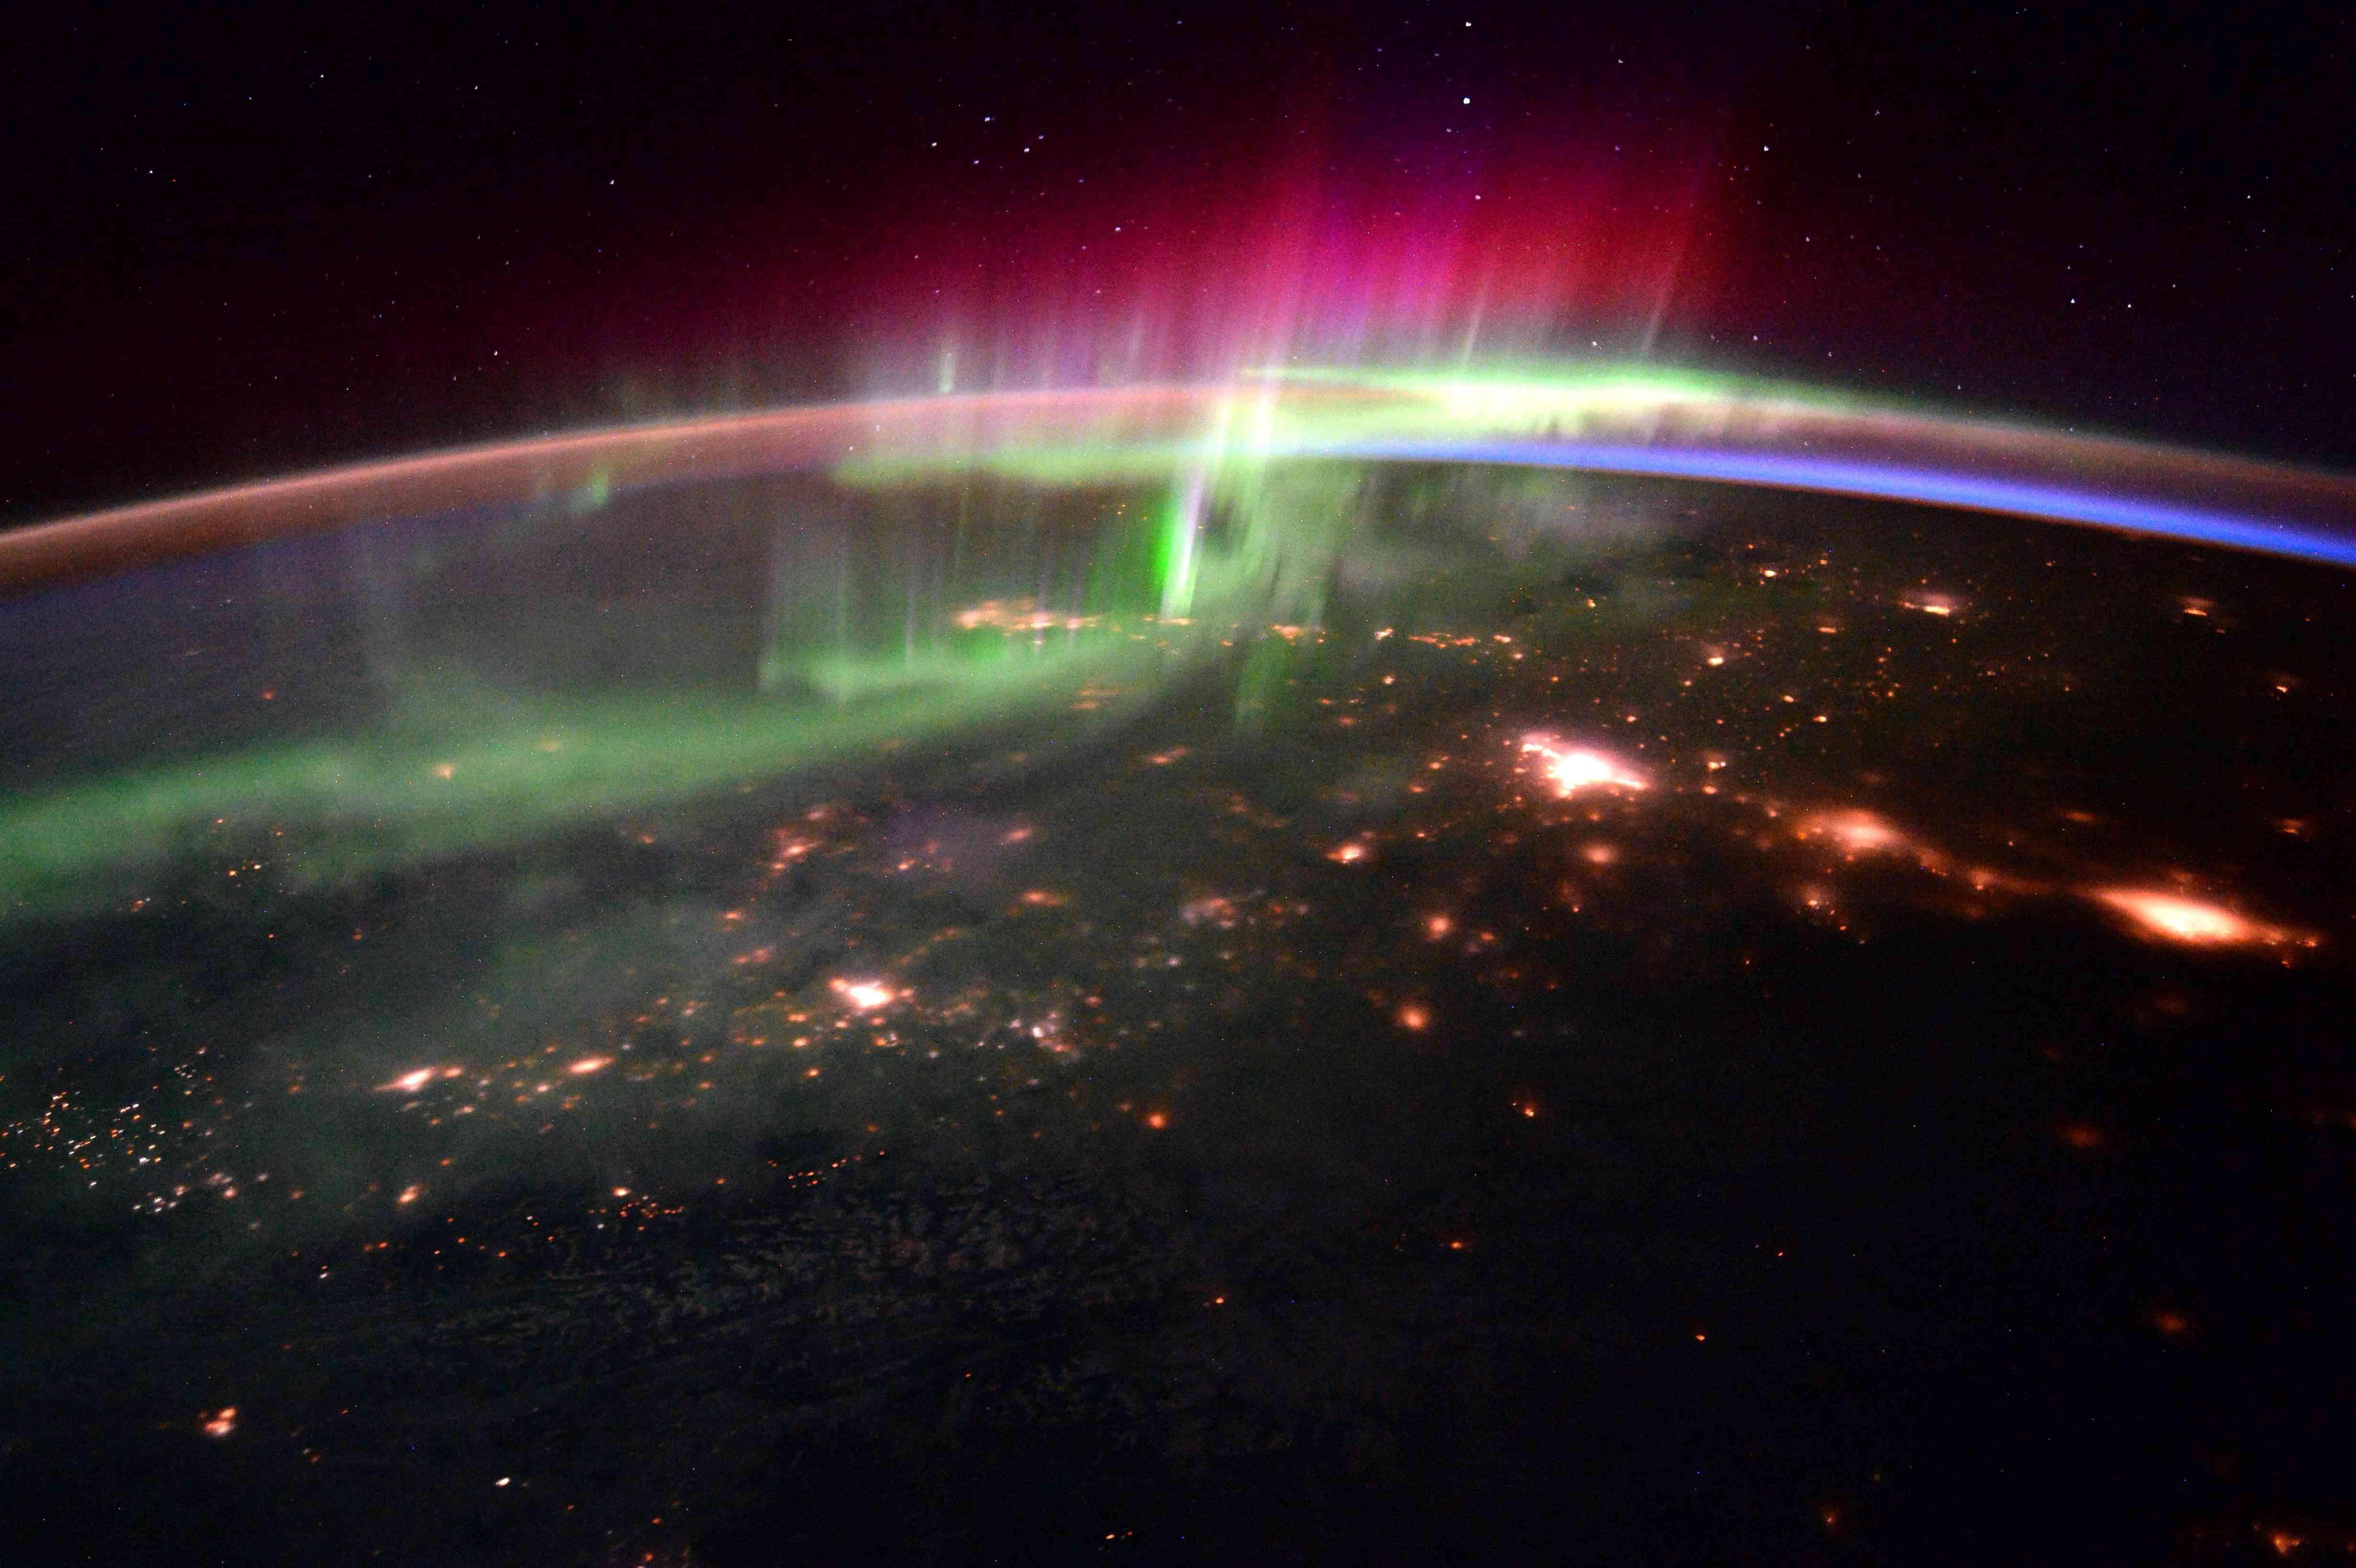 aurora borealis from space